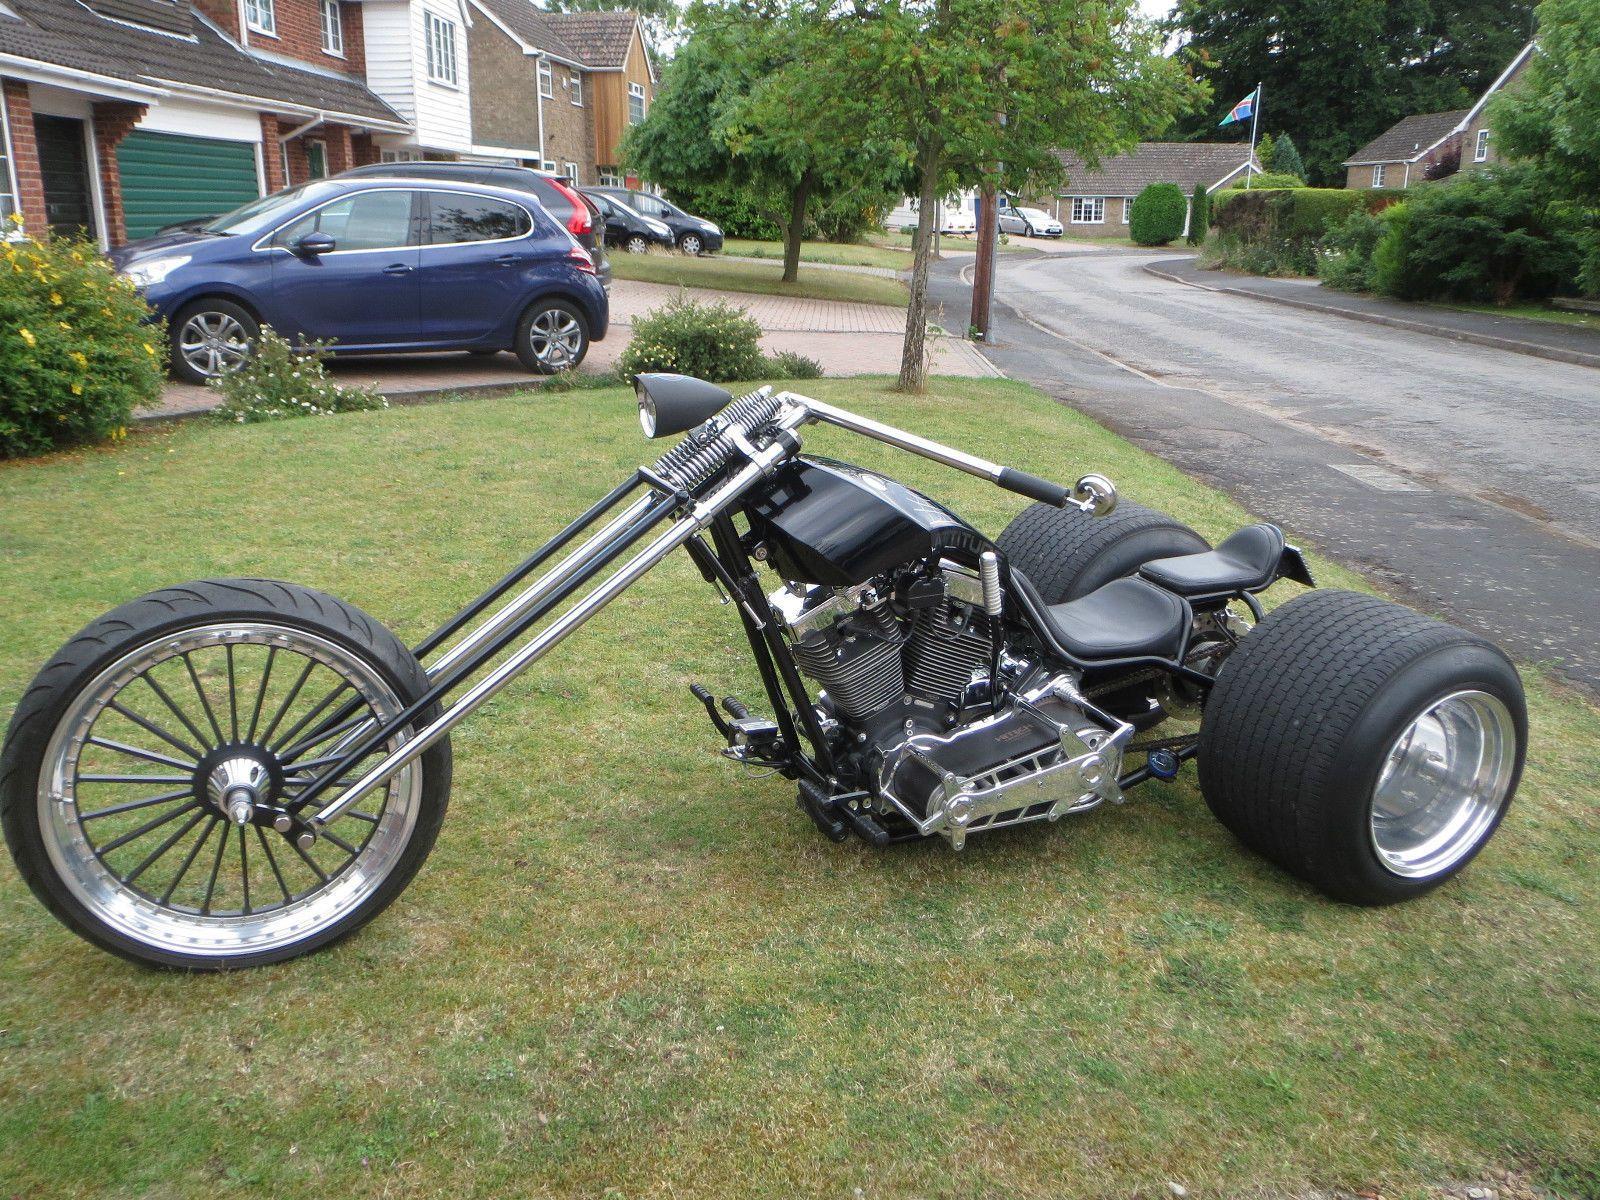 1800cc Custom Yamaha Trike built by Attitude Customs in 2011 ...